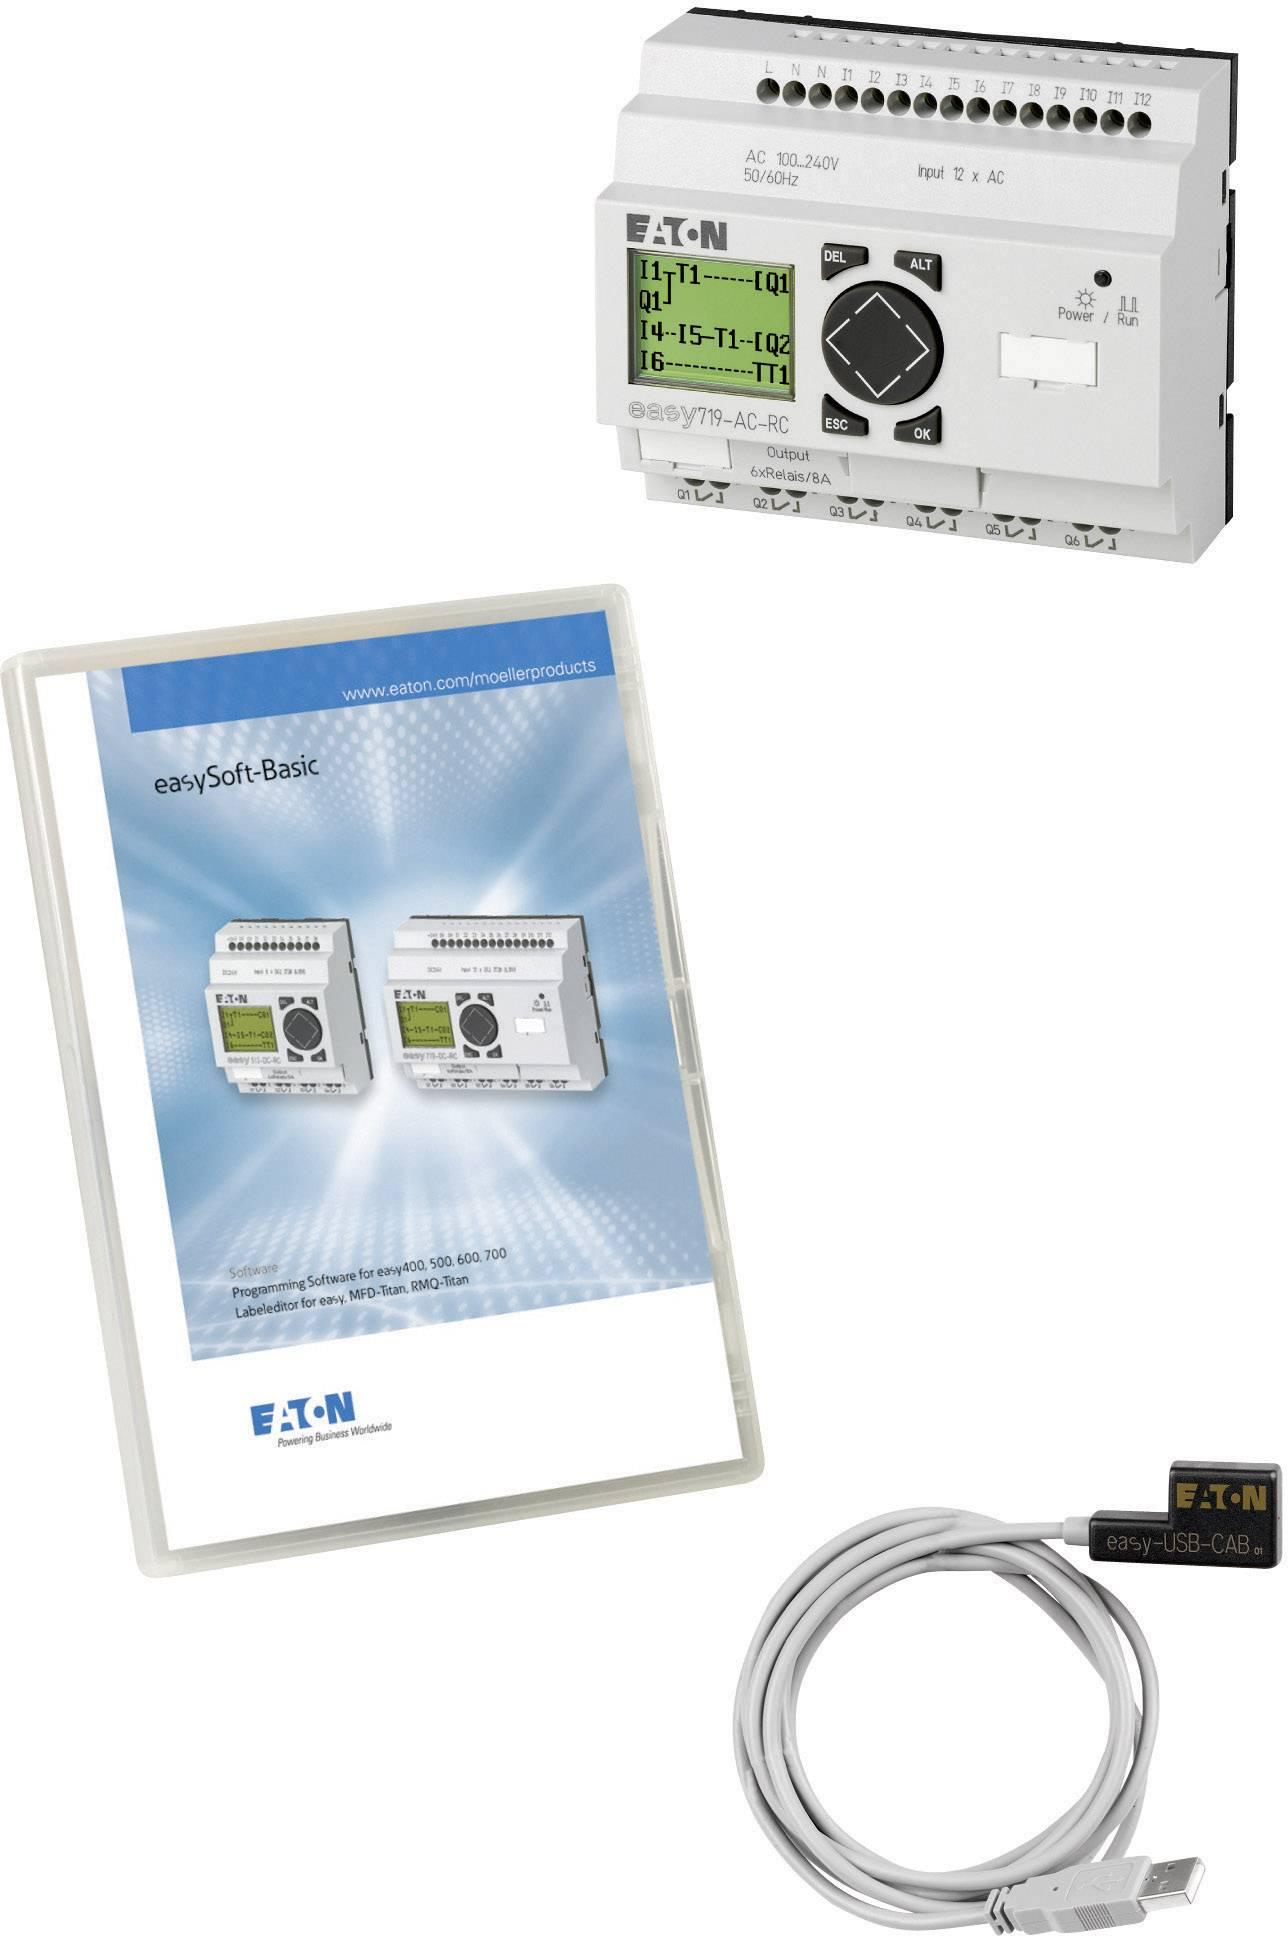 Štartovacia súprava Eaton easy-MIDI-Box-USB DC 116565, 24 V/DC